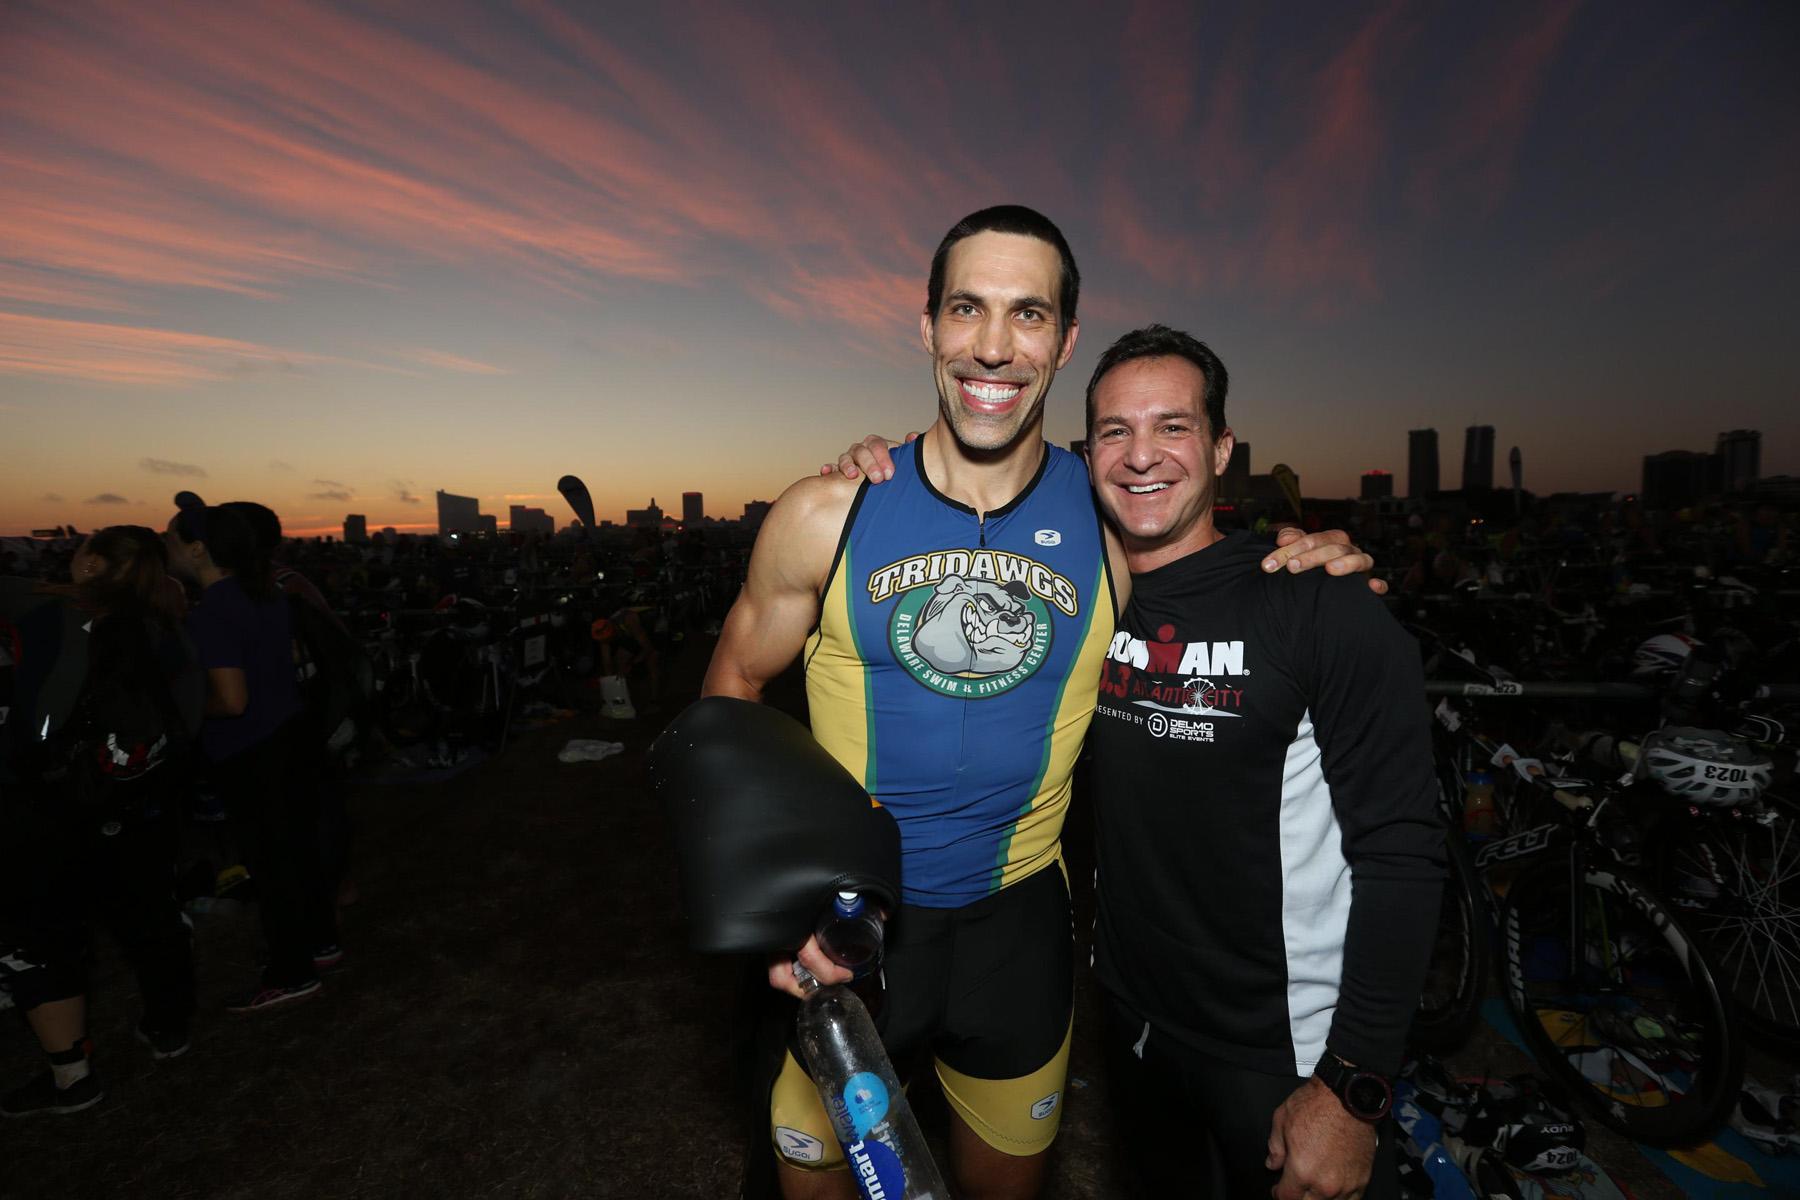 Sunrise glow - Ironman 70.3 Atlantic City